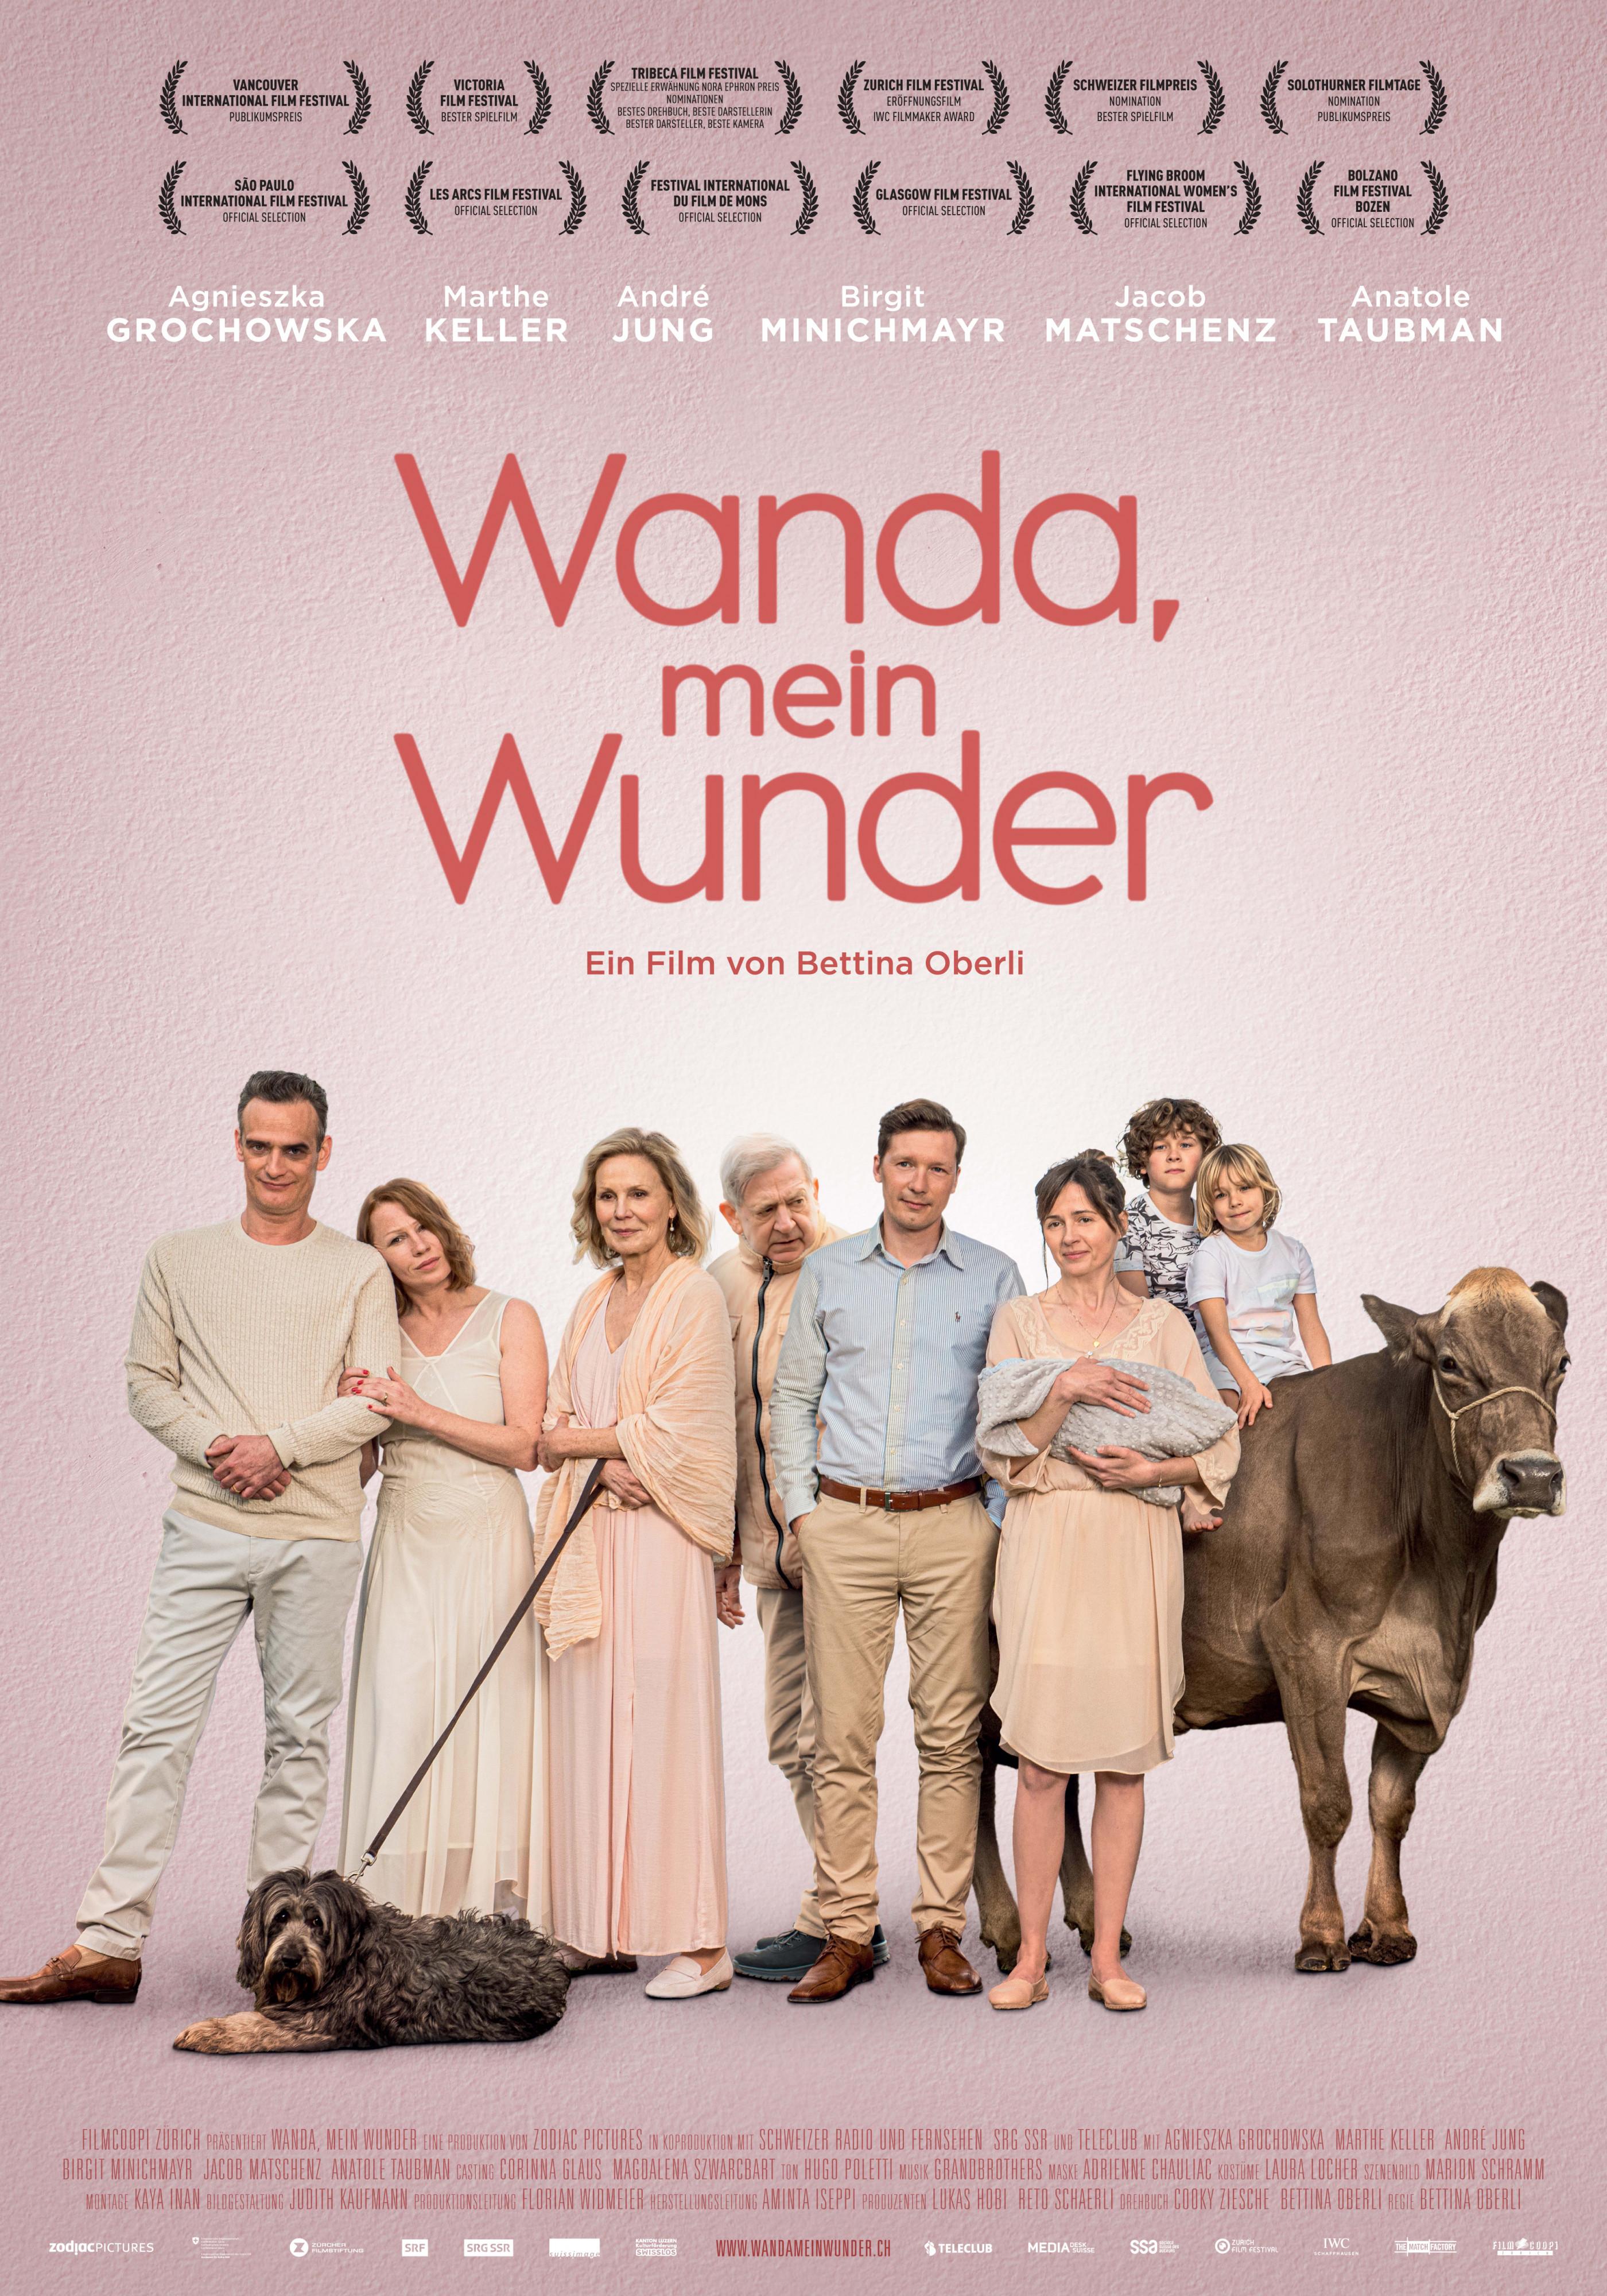 Plakat: Wanda, Mein Wunder